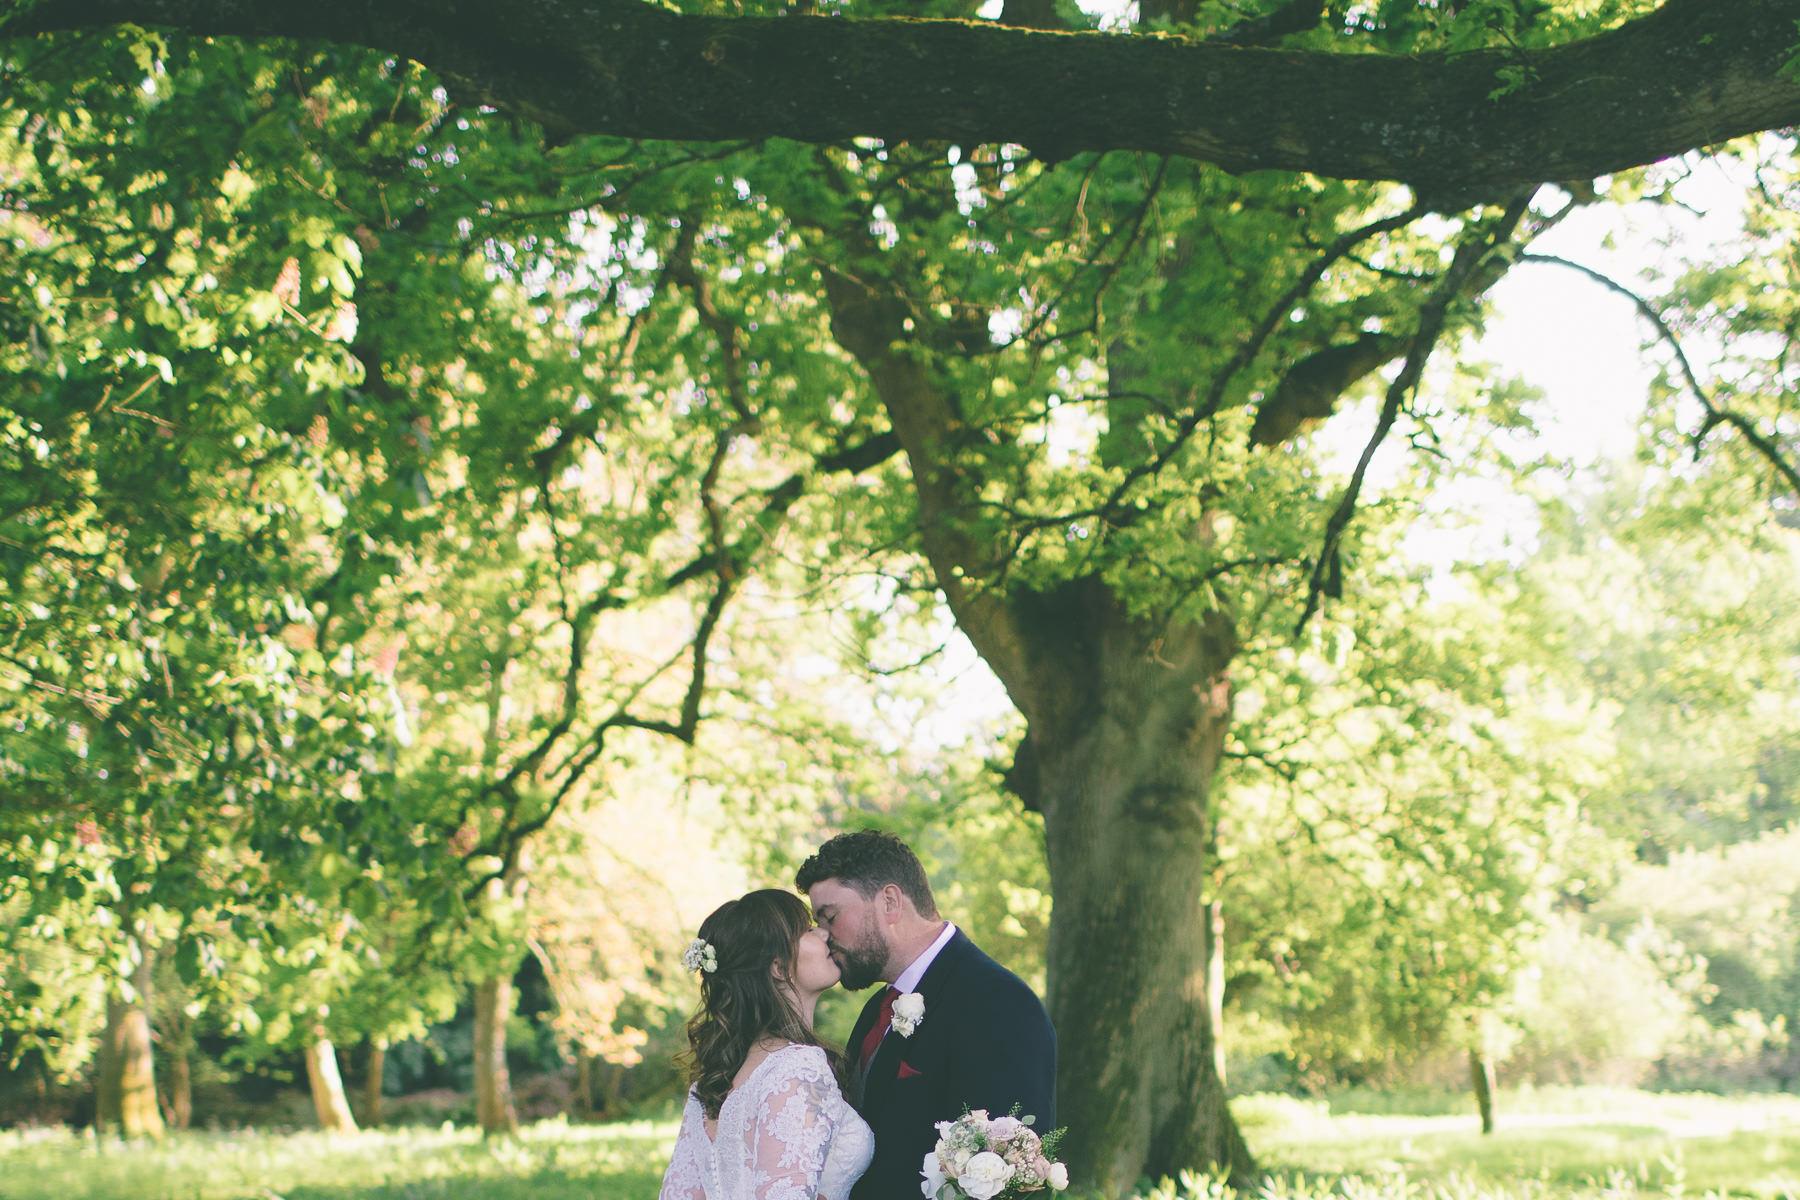 Pamber-Place-wedding-photography-basingstoke-hampshire-183